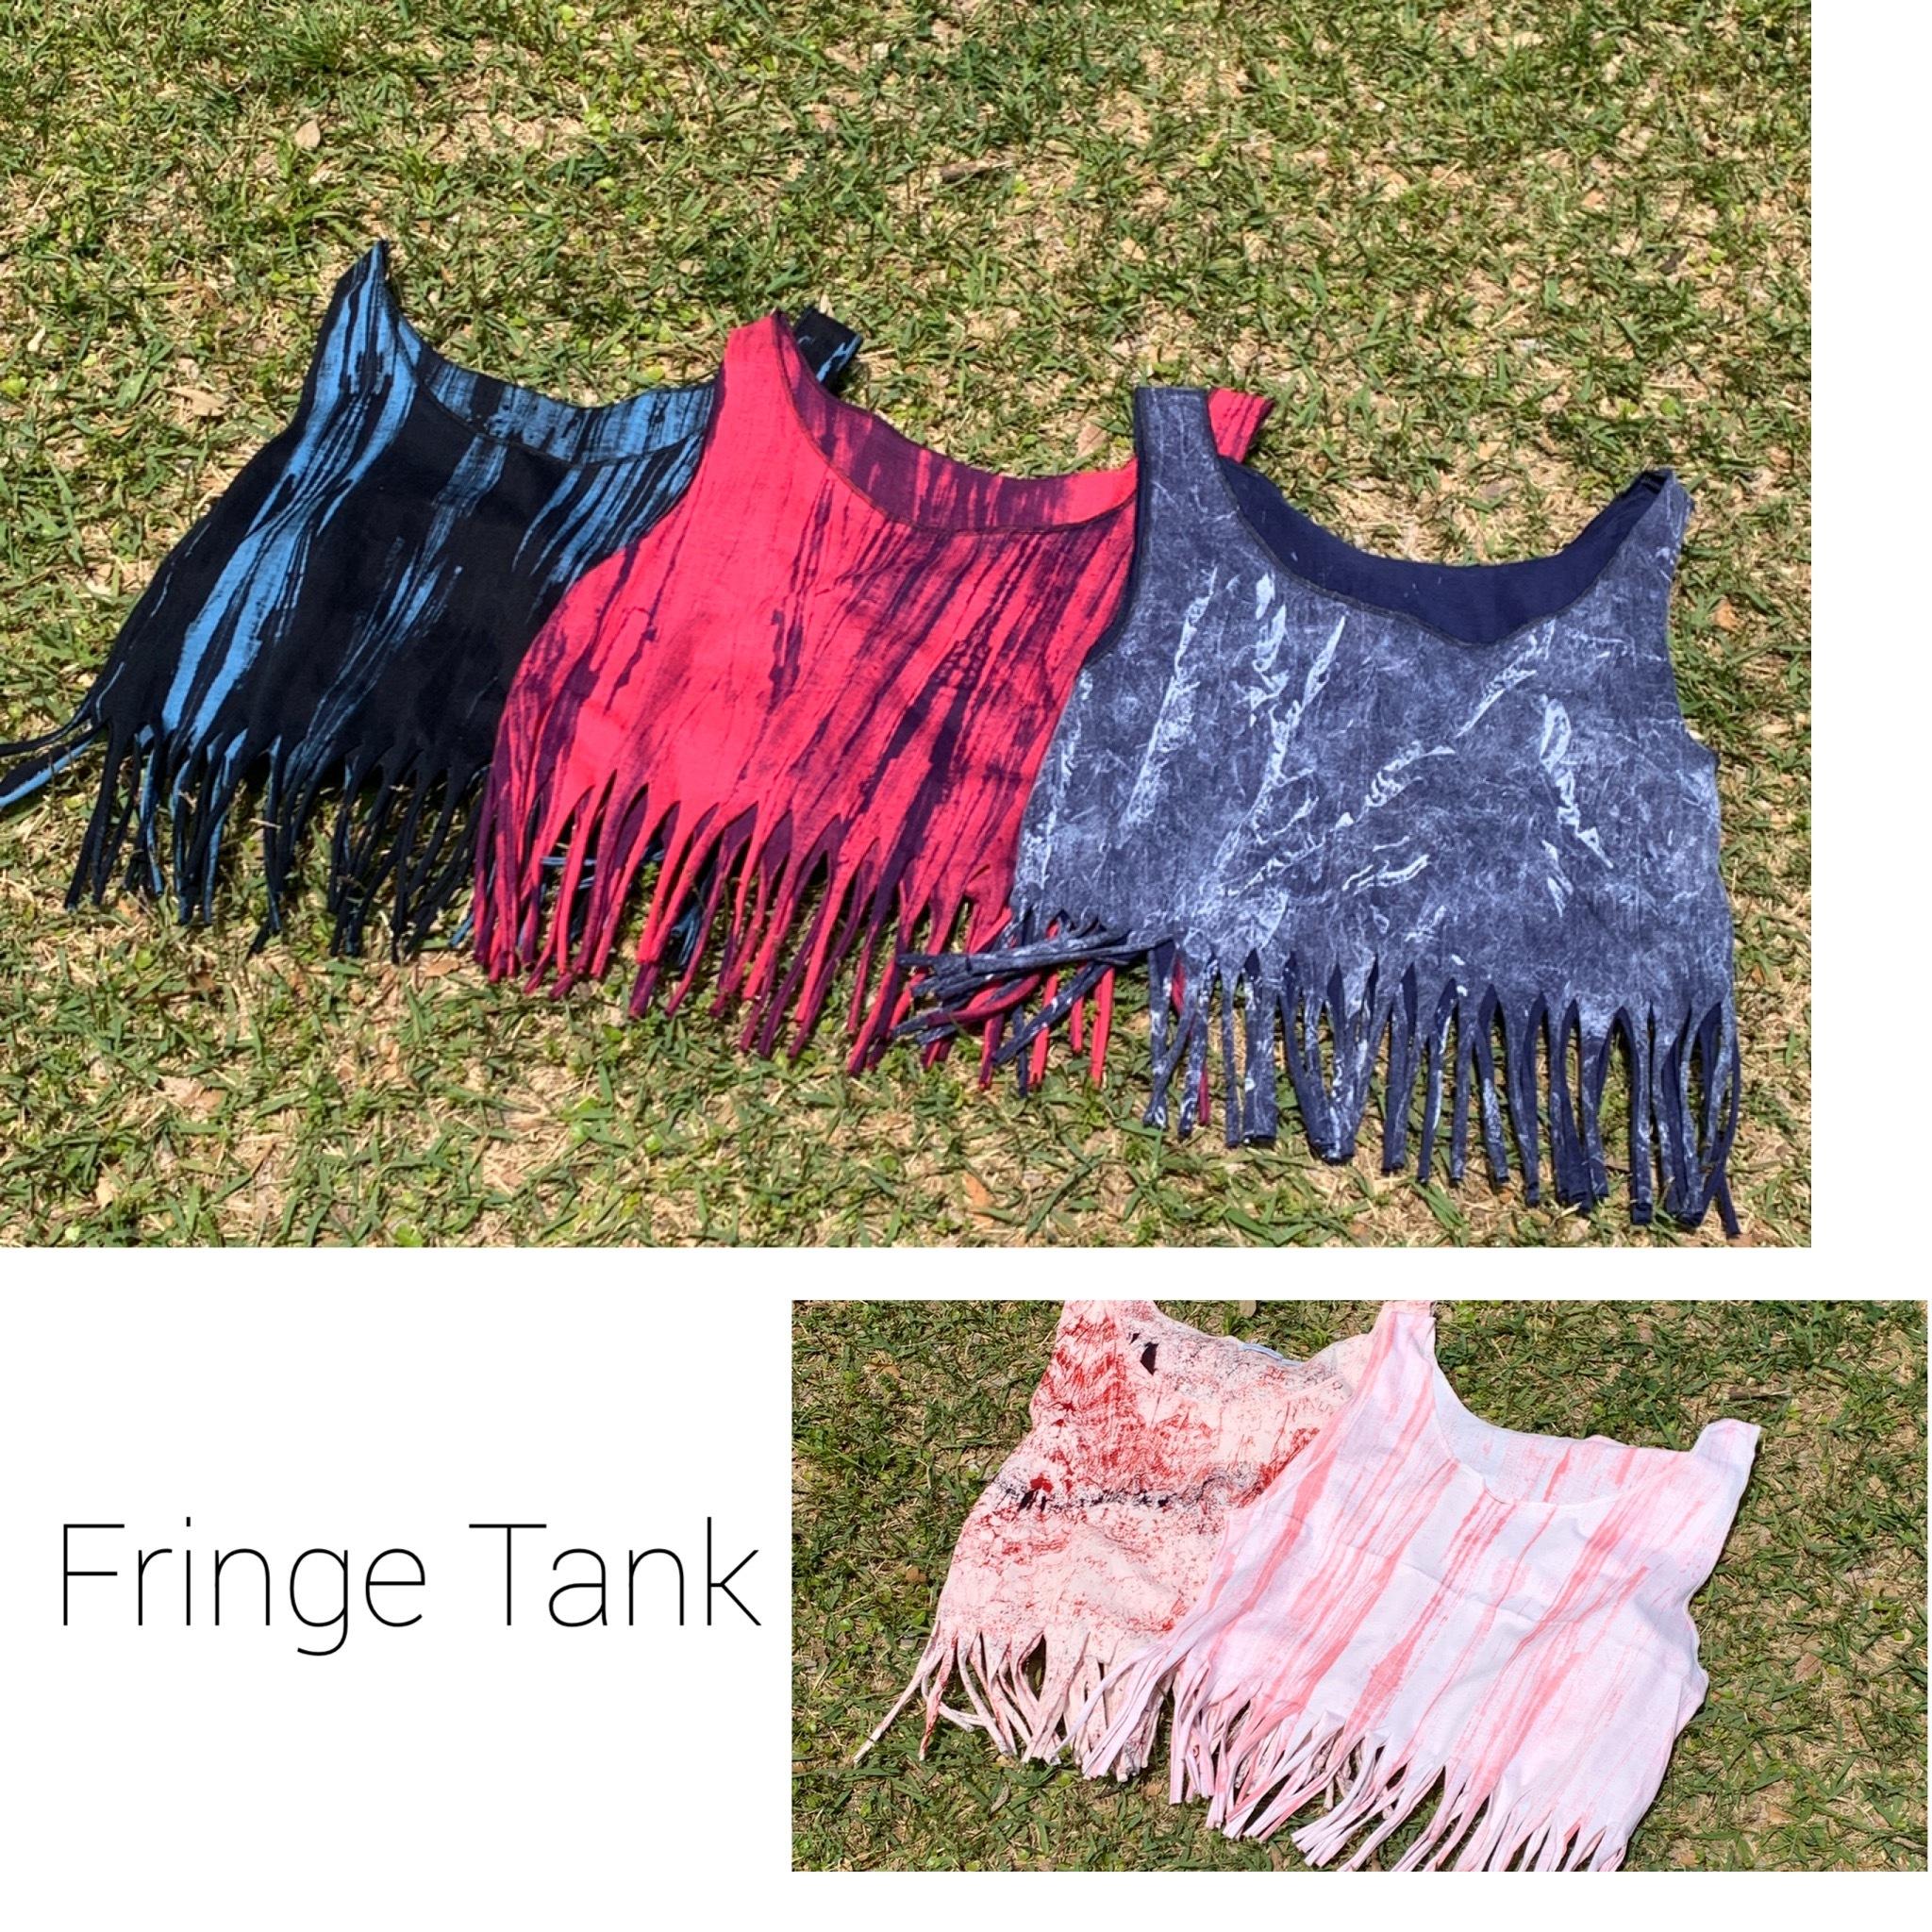 Fringe Tank Top